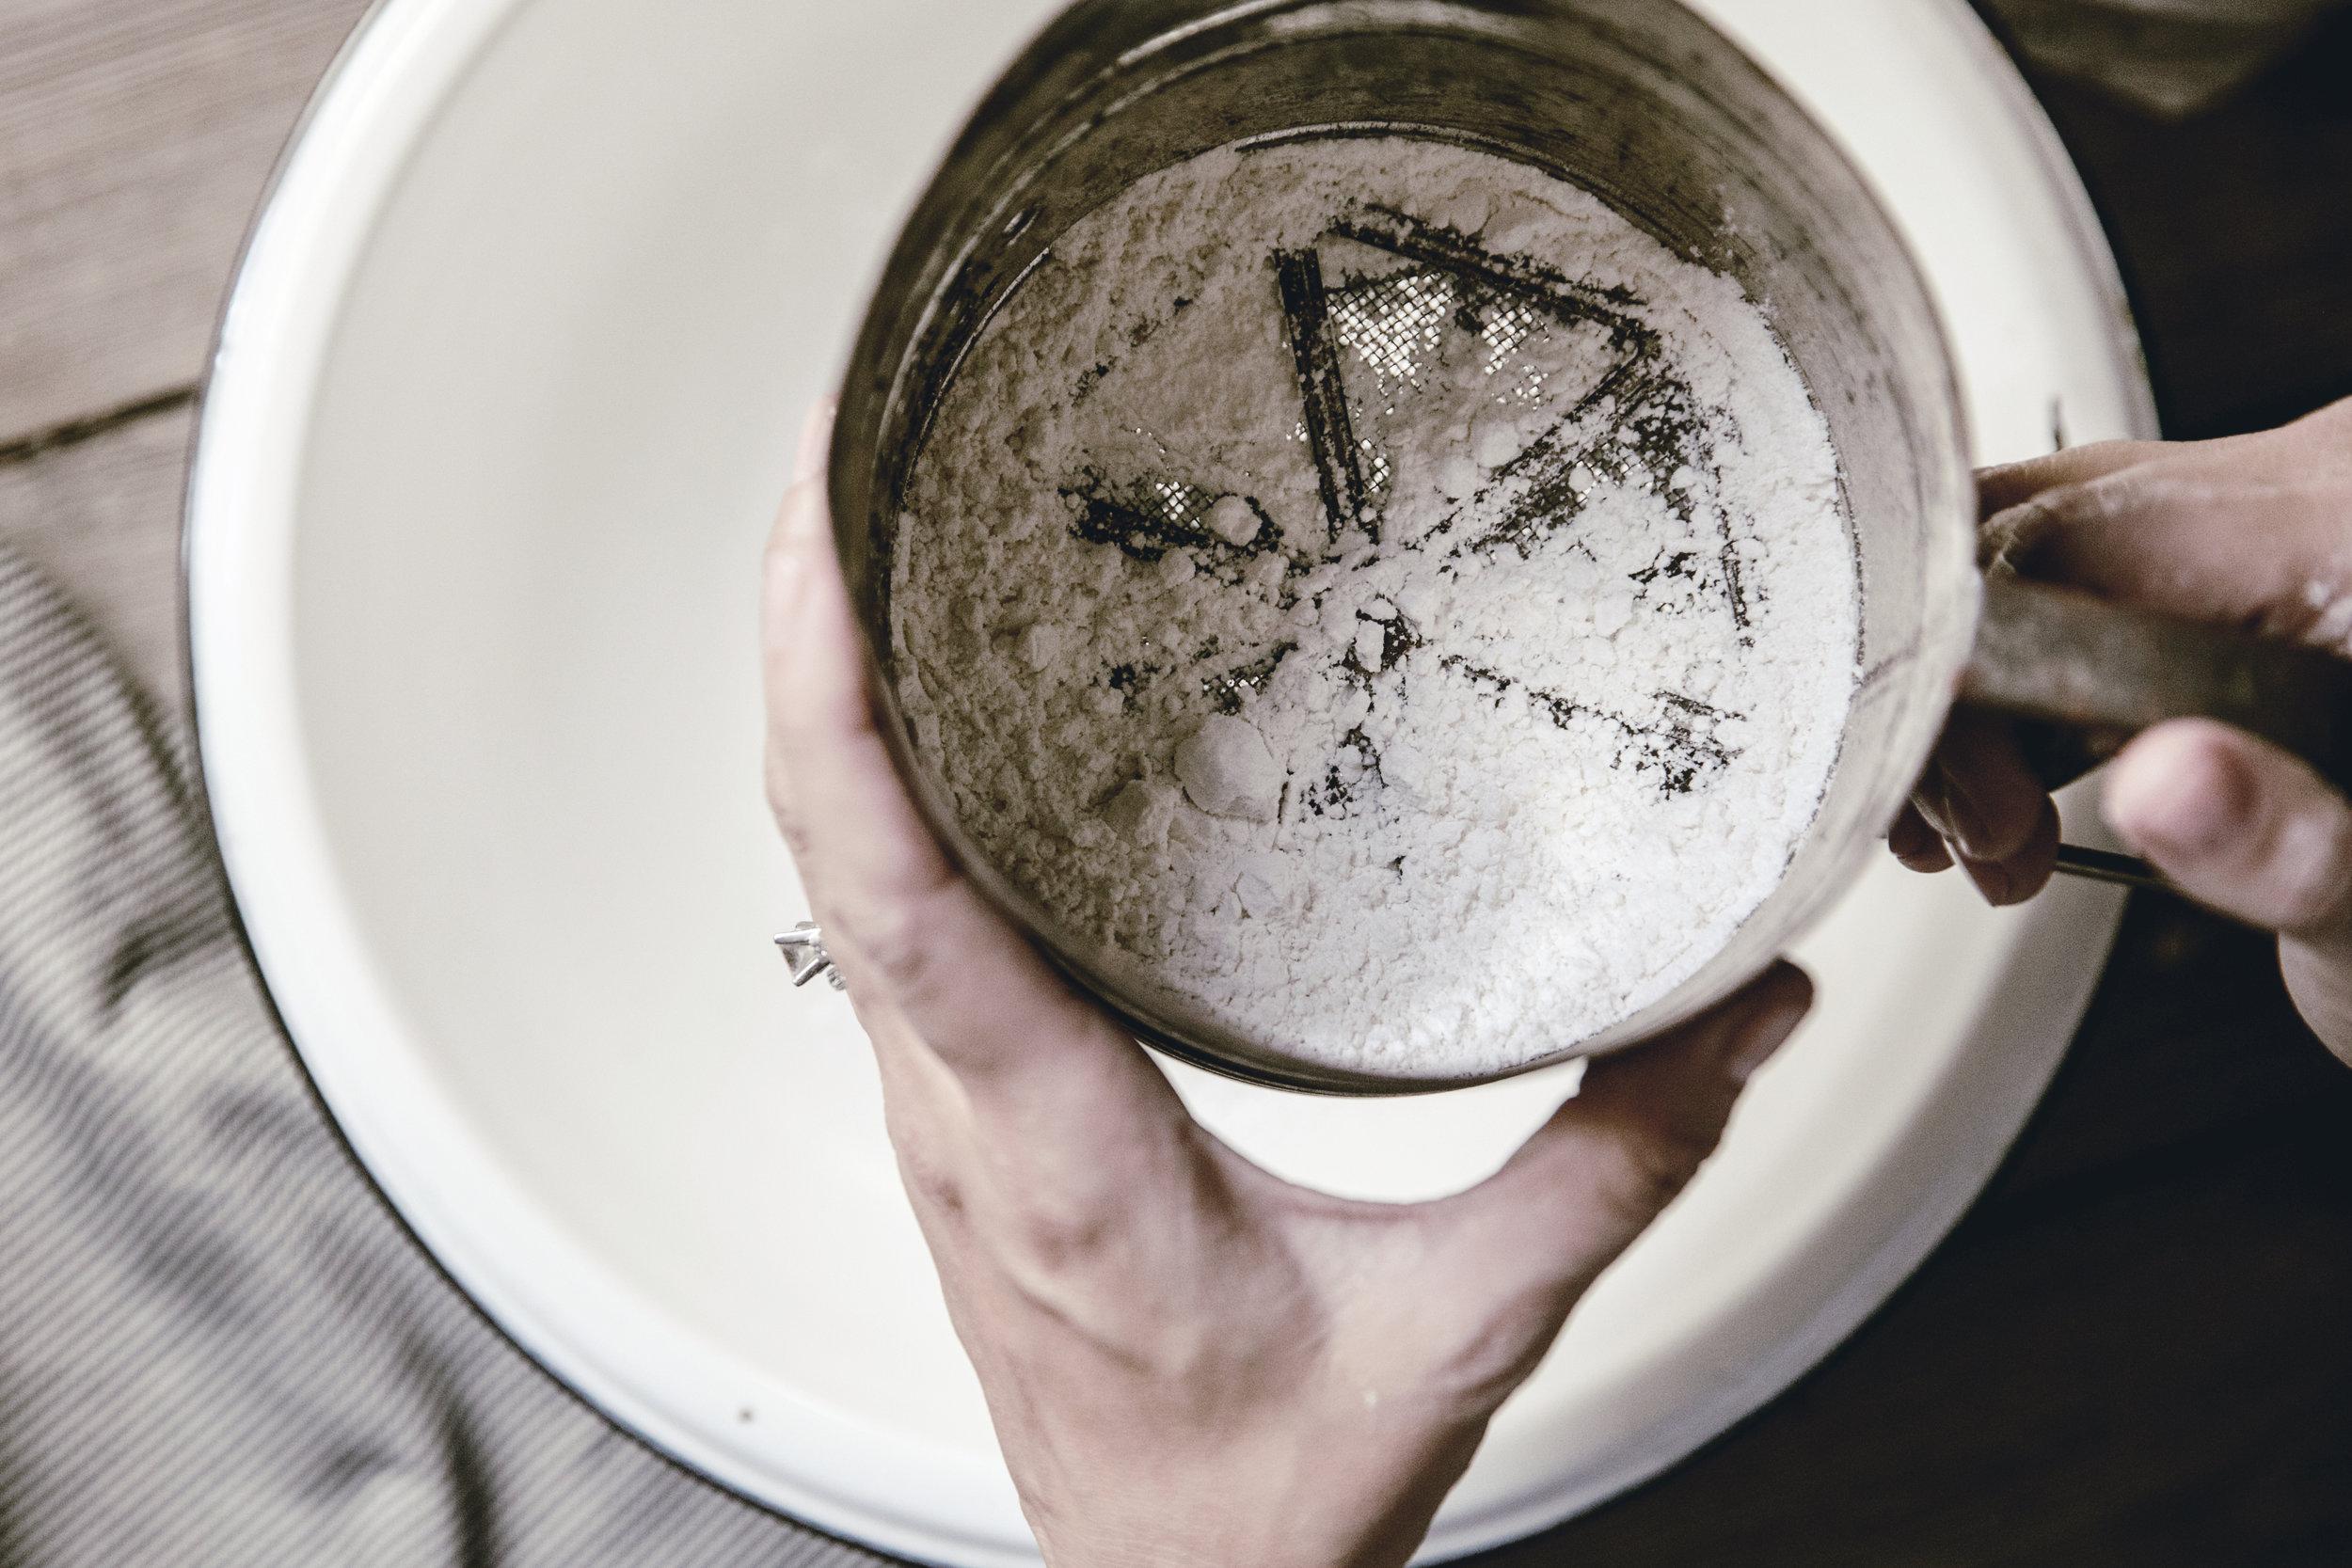 vintage flour sifter / sifting flour / heirloomed